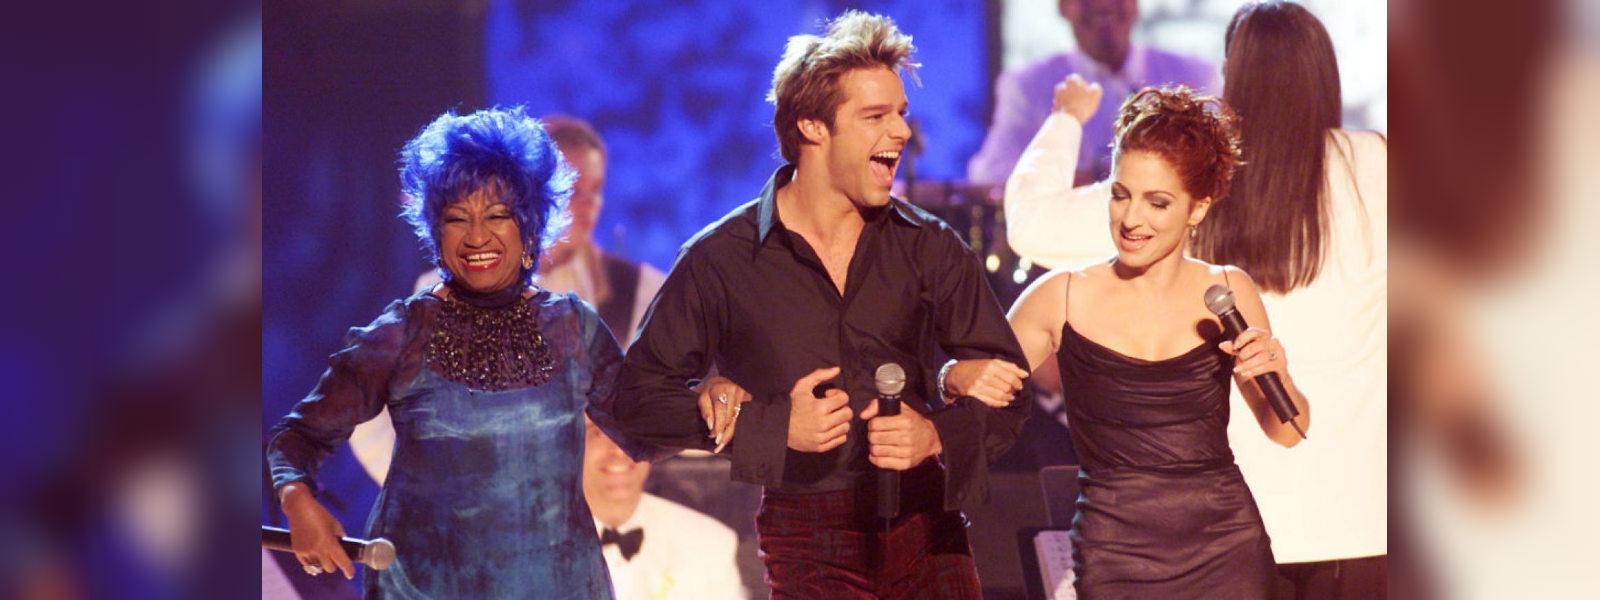 'Gracias Totales'- Latin Grammy awards celebrate 20 years